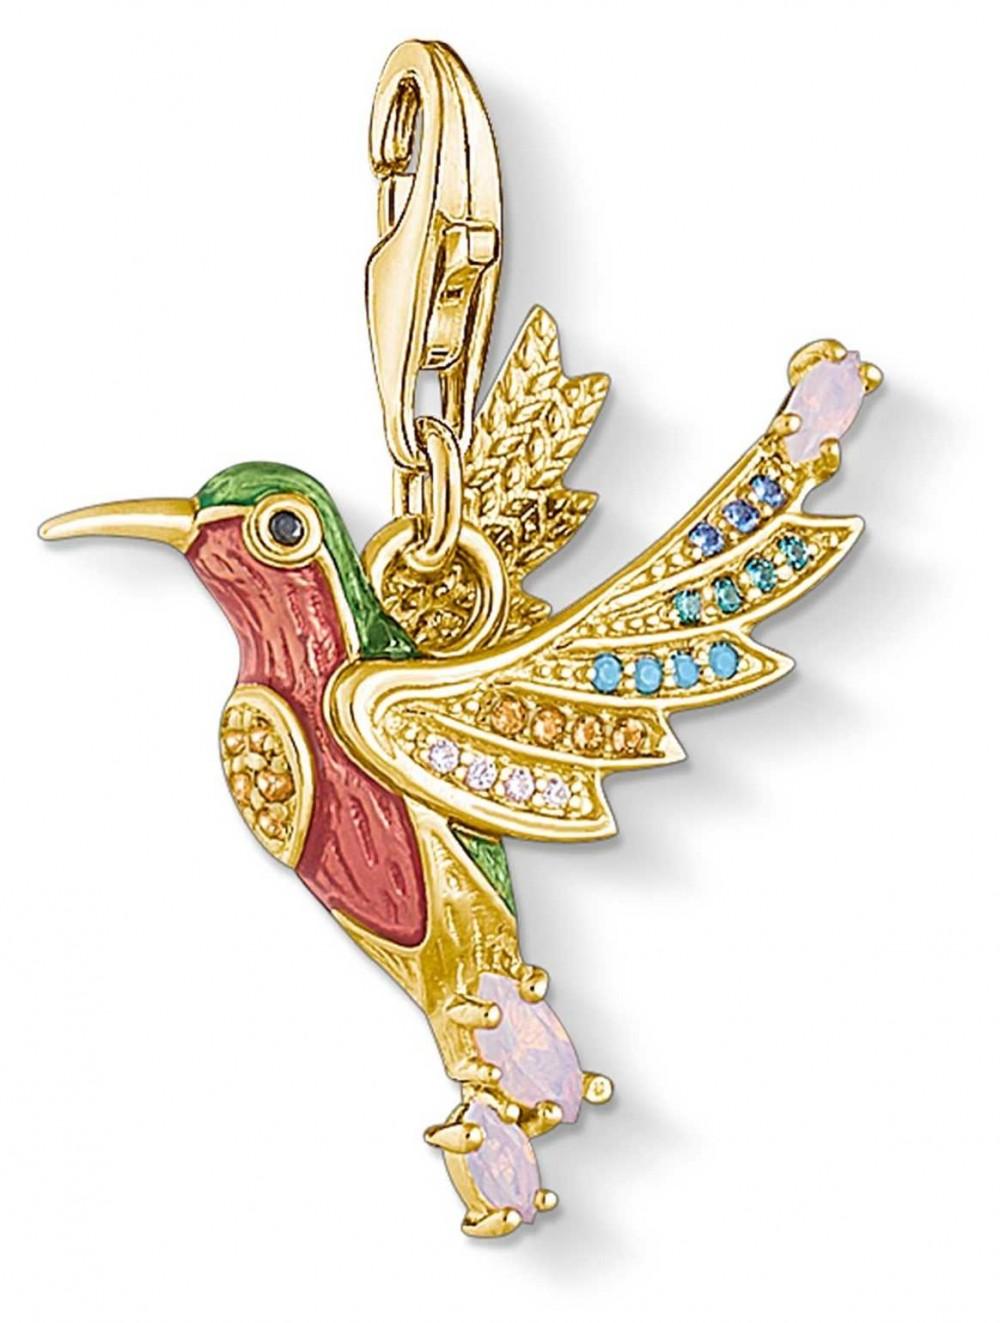 Thomas Sabo | Charm Pendant Colourful Humming Bird | Gold 1828-974-7